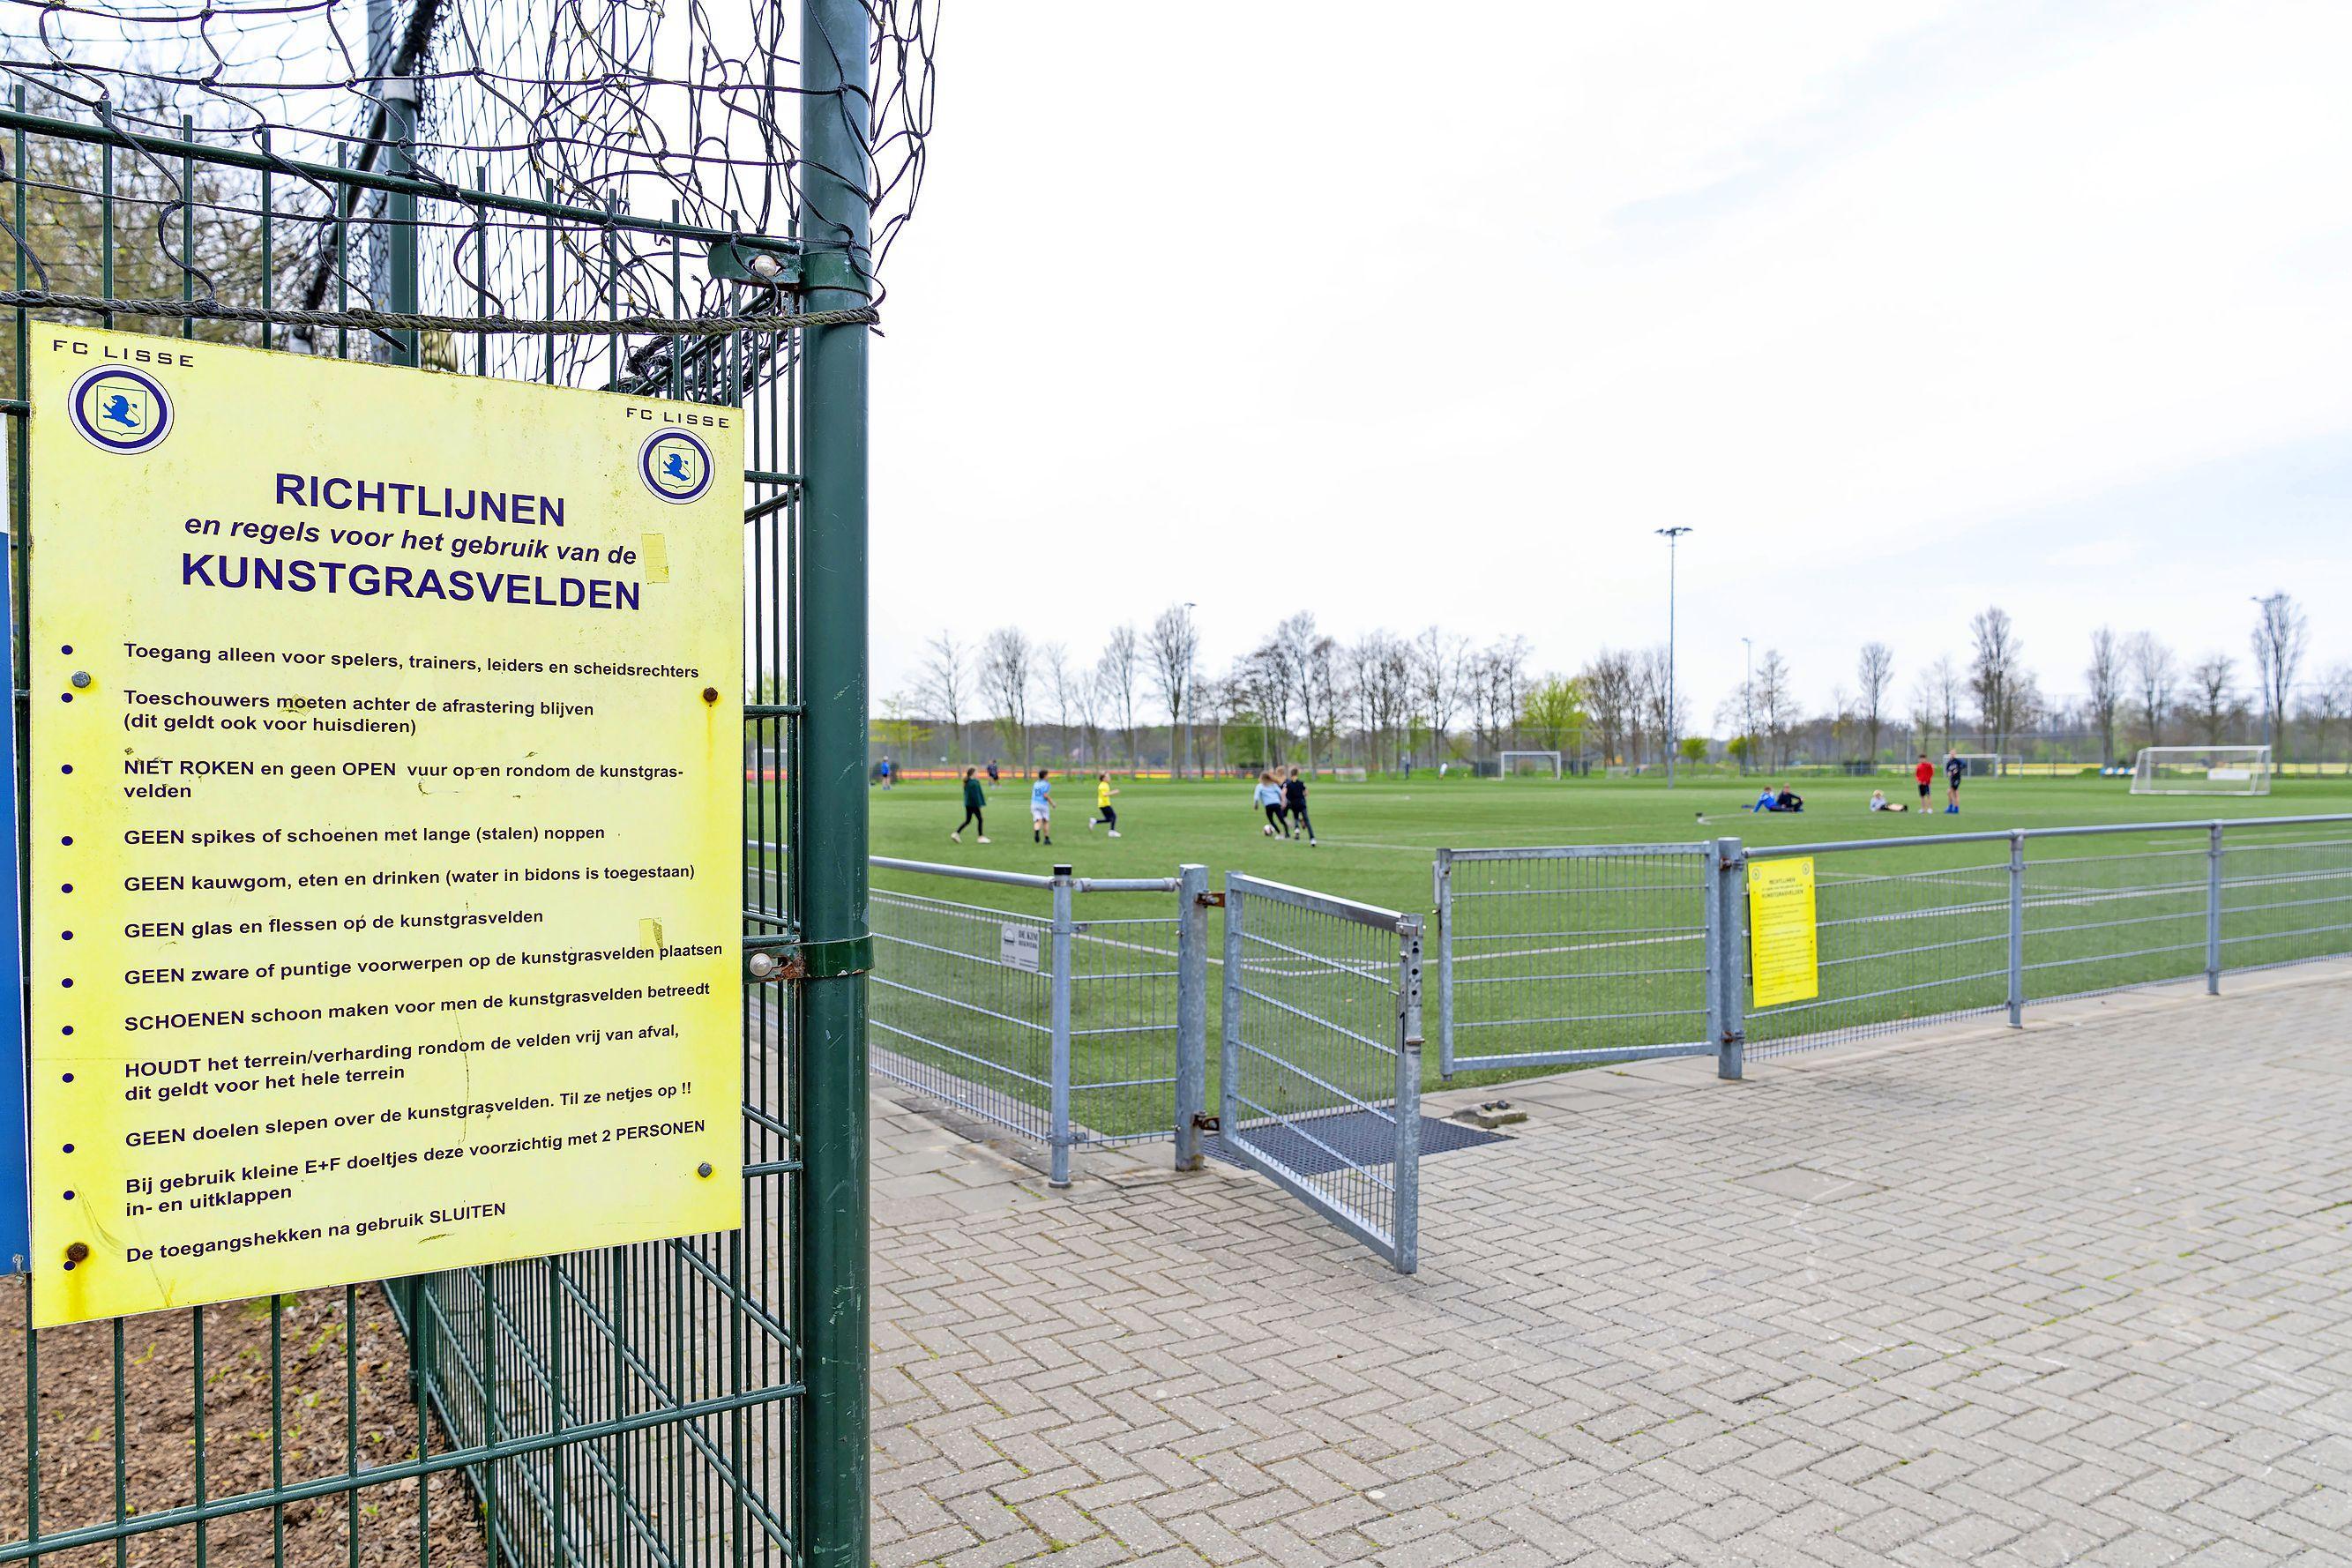 Toch rubbergranulaat op voetbalvelden FC Lisse